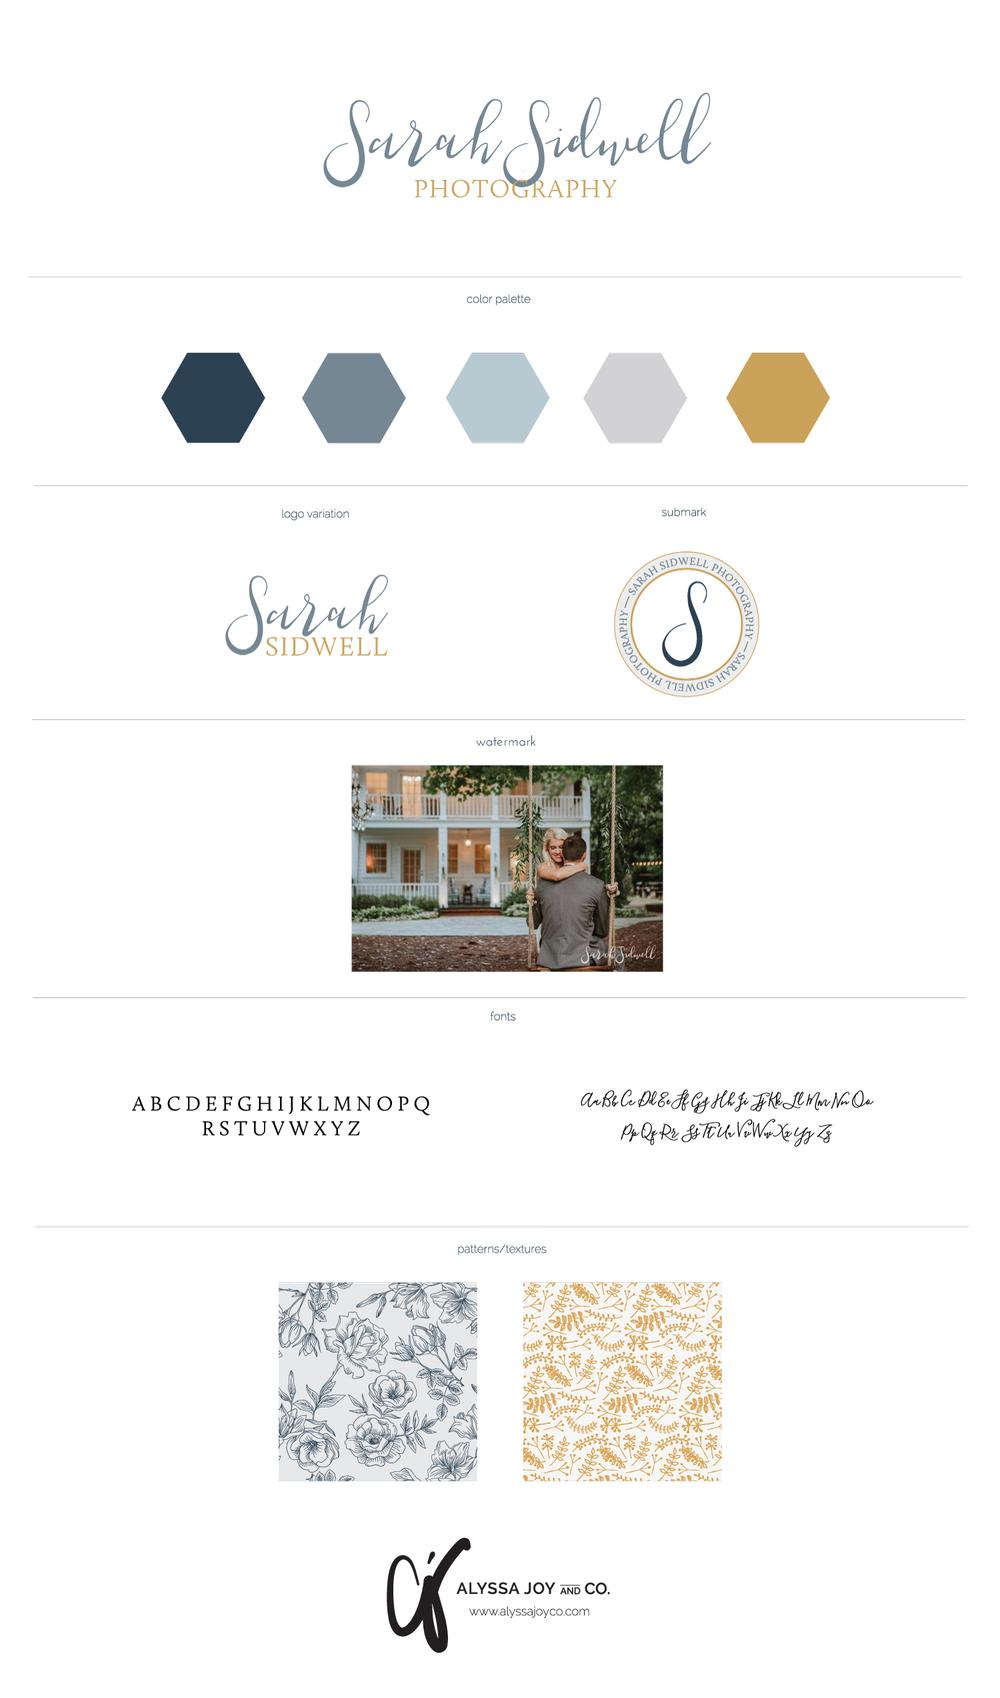 Alyssa Joy & Co. || Brand Design for Sarah Sidwell Photography